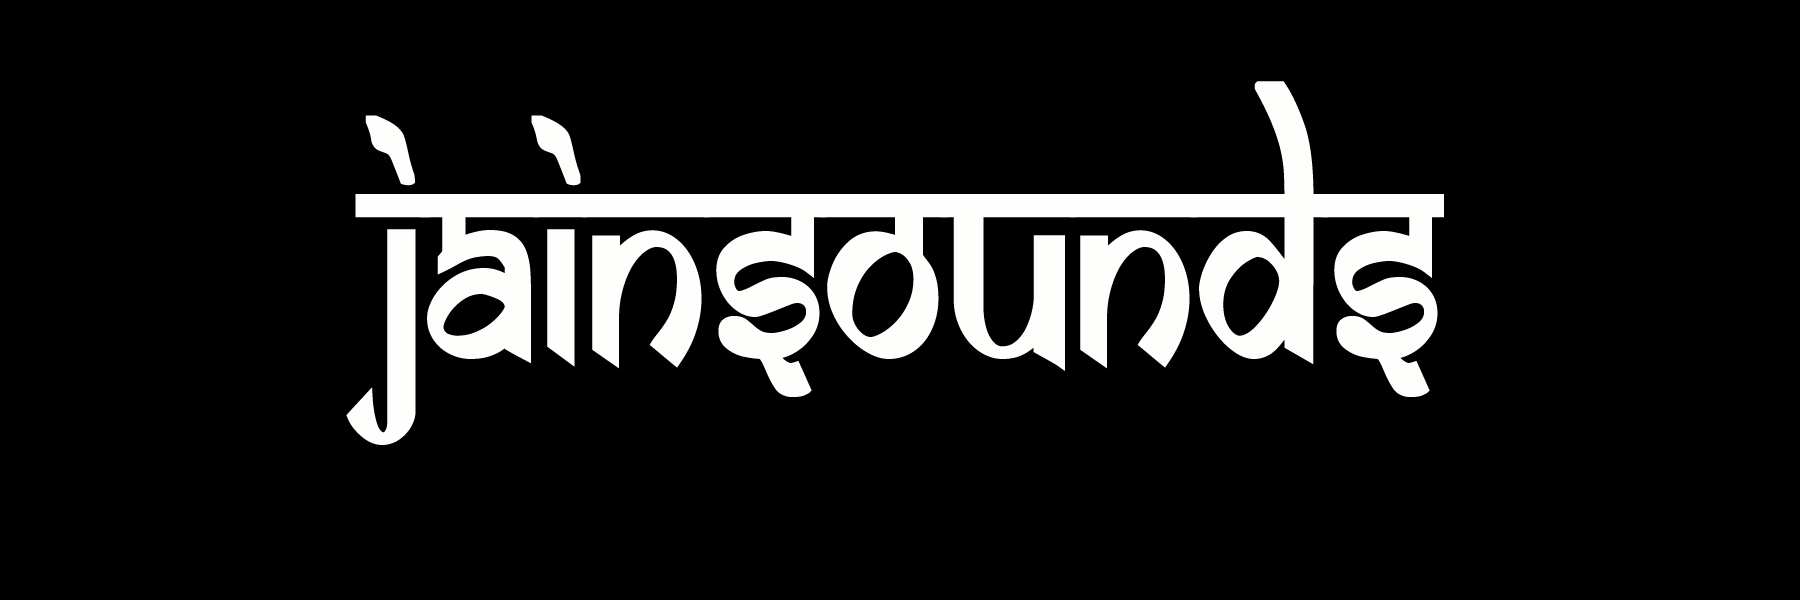 Jainsounds Logo - Indian Marching Bands & Dhols